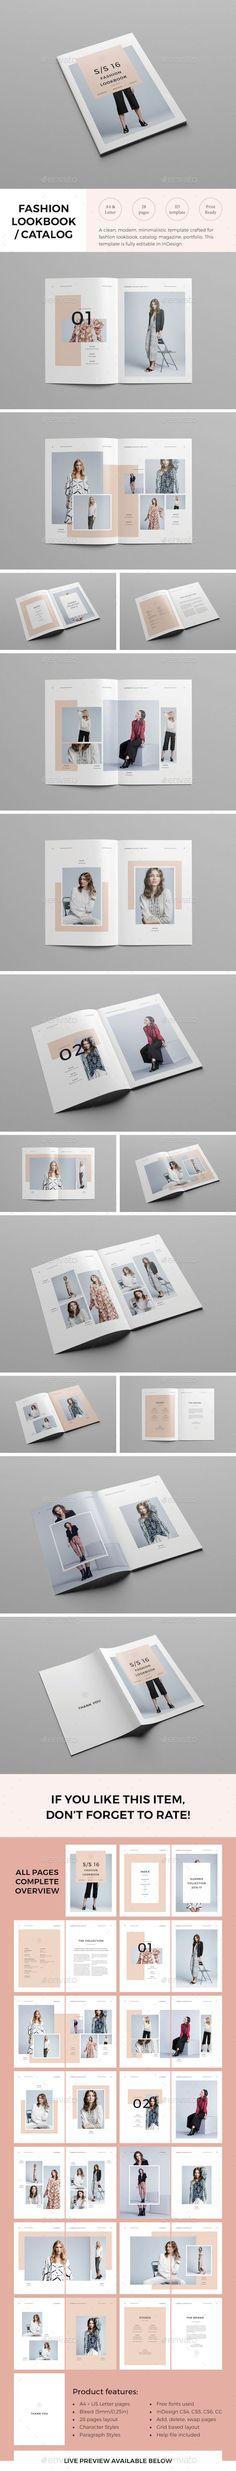 Lookbook Template InDesign INDD. Download here: